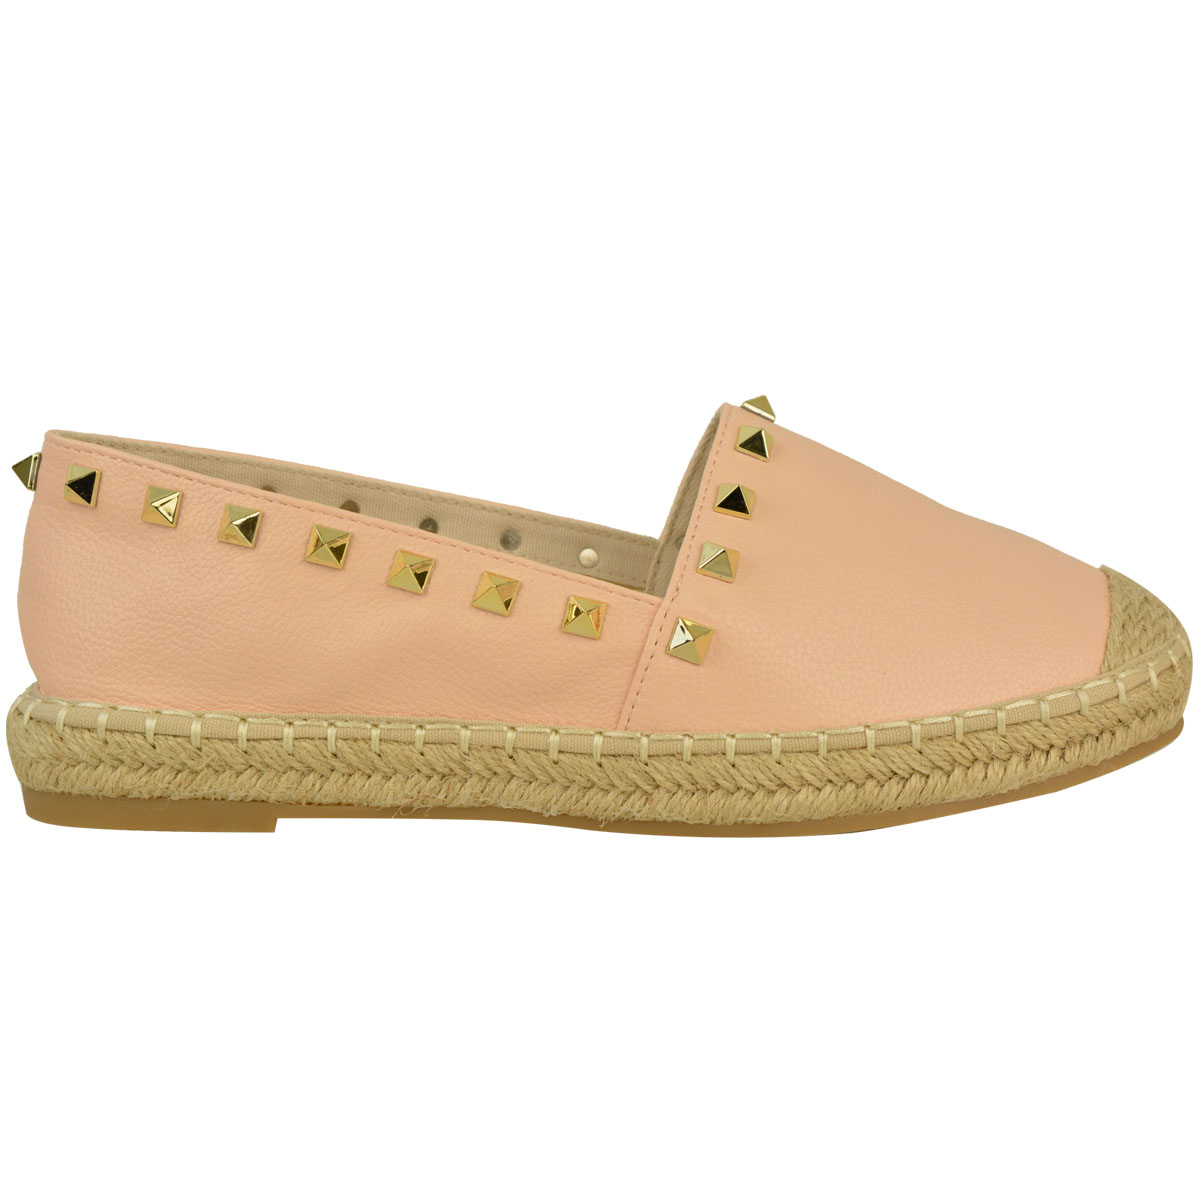 Womens Ladies Studded Espadrilles Slip On Flats Summer ...